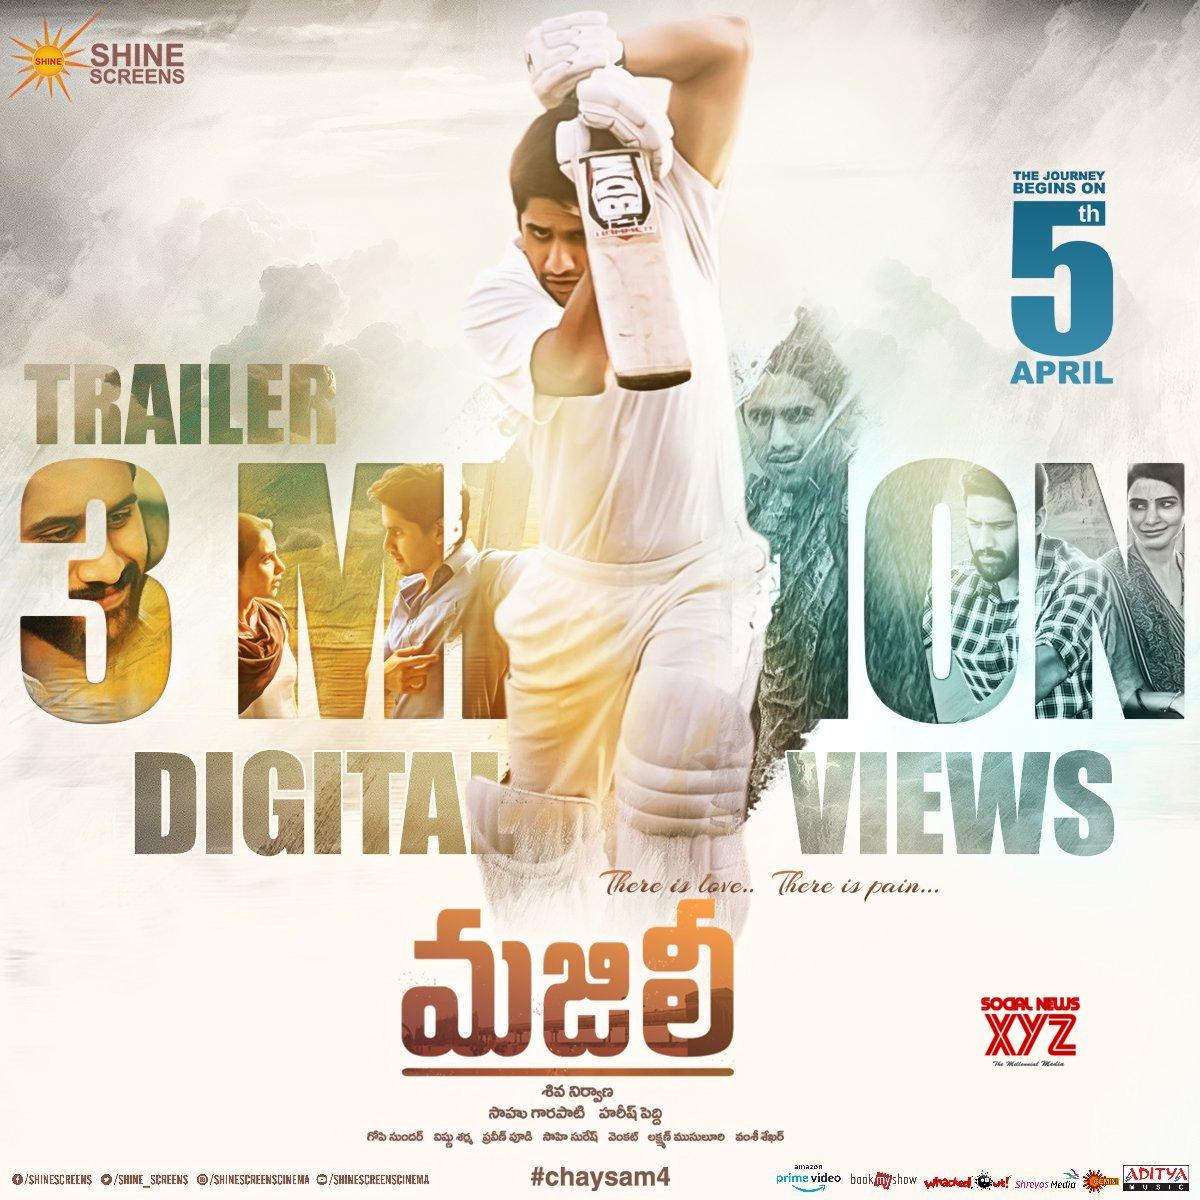 Majili Trailer Crosses 3 Million Digital Views In Less Than 22 Hrs